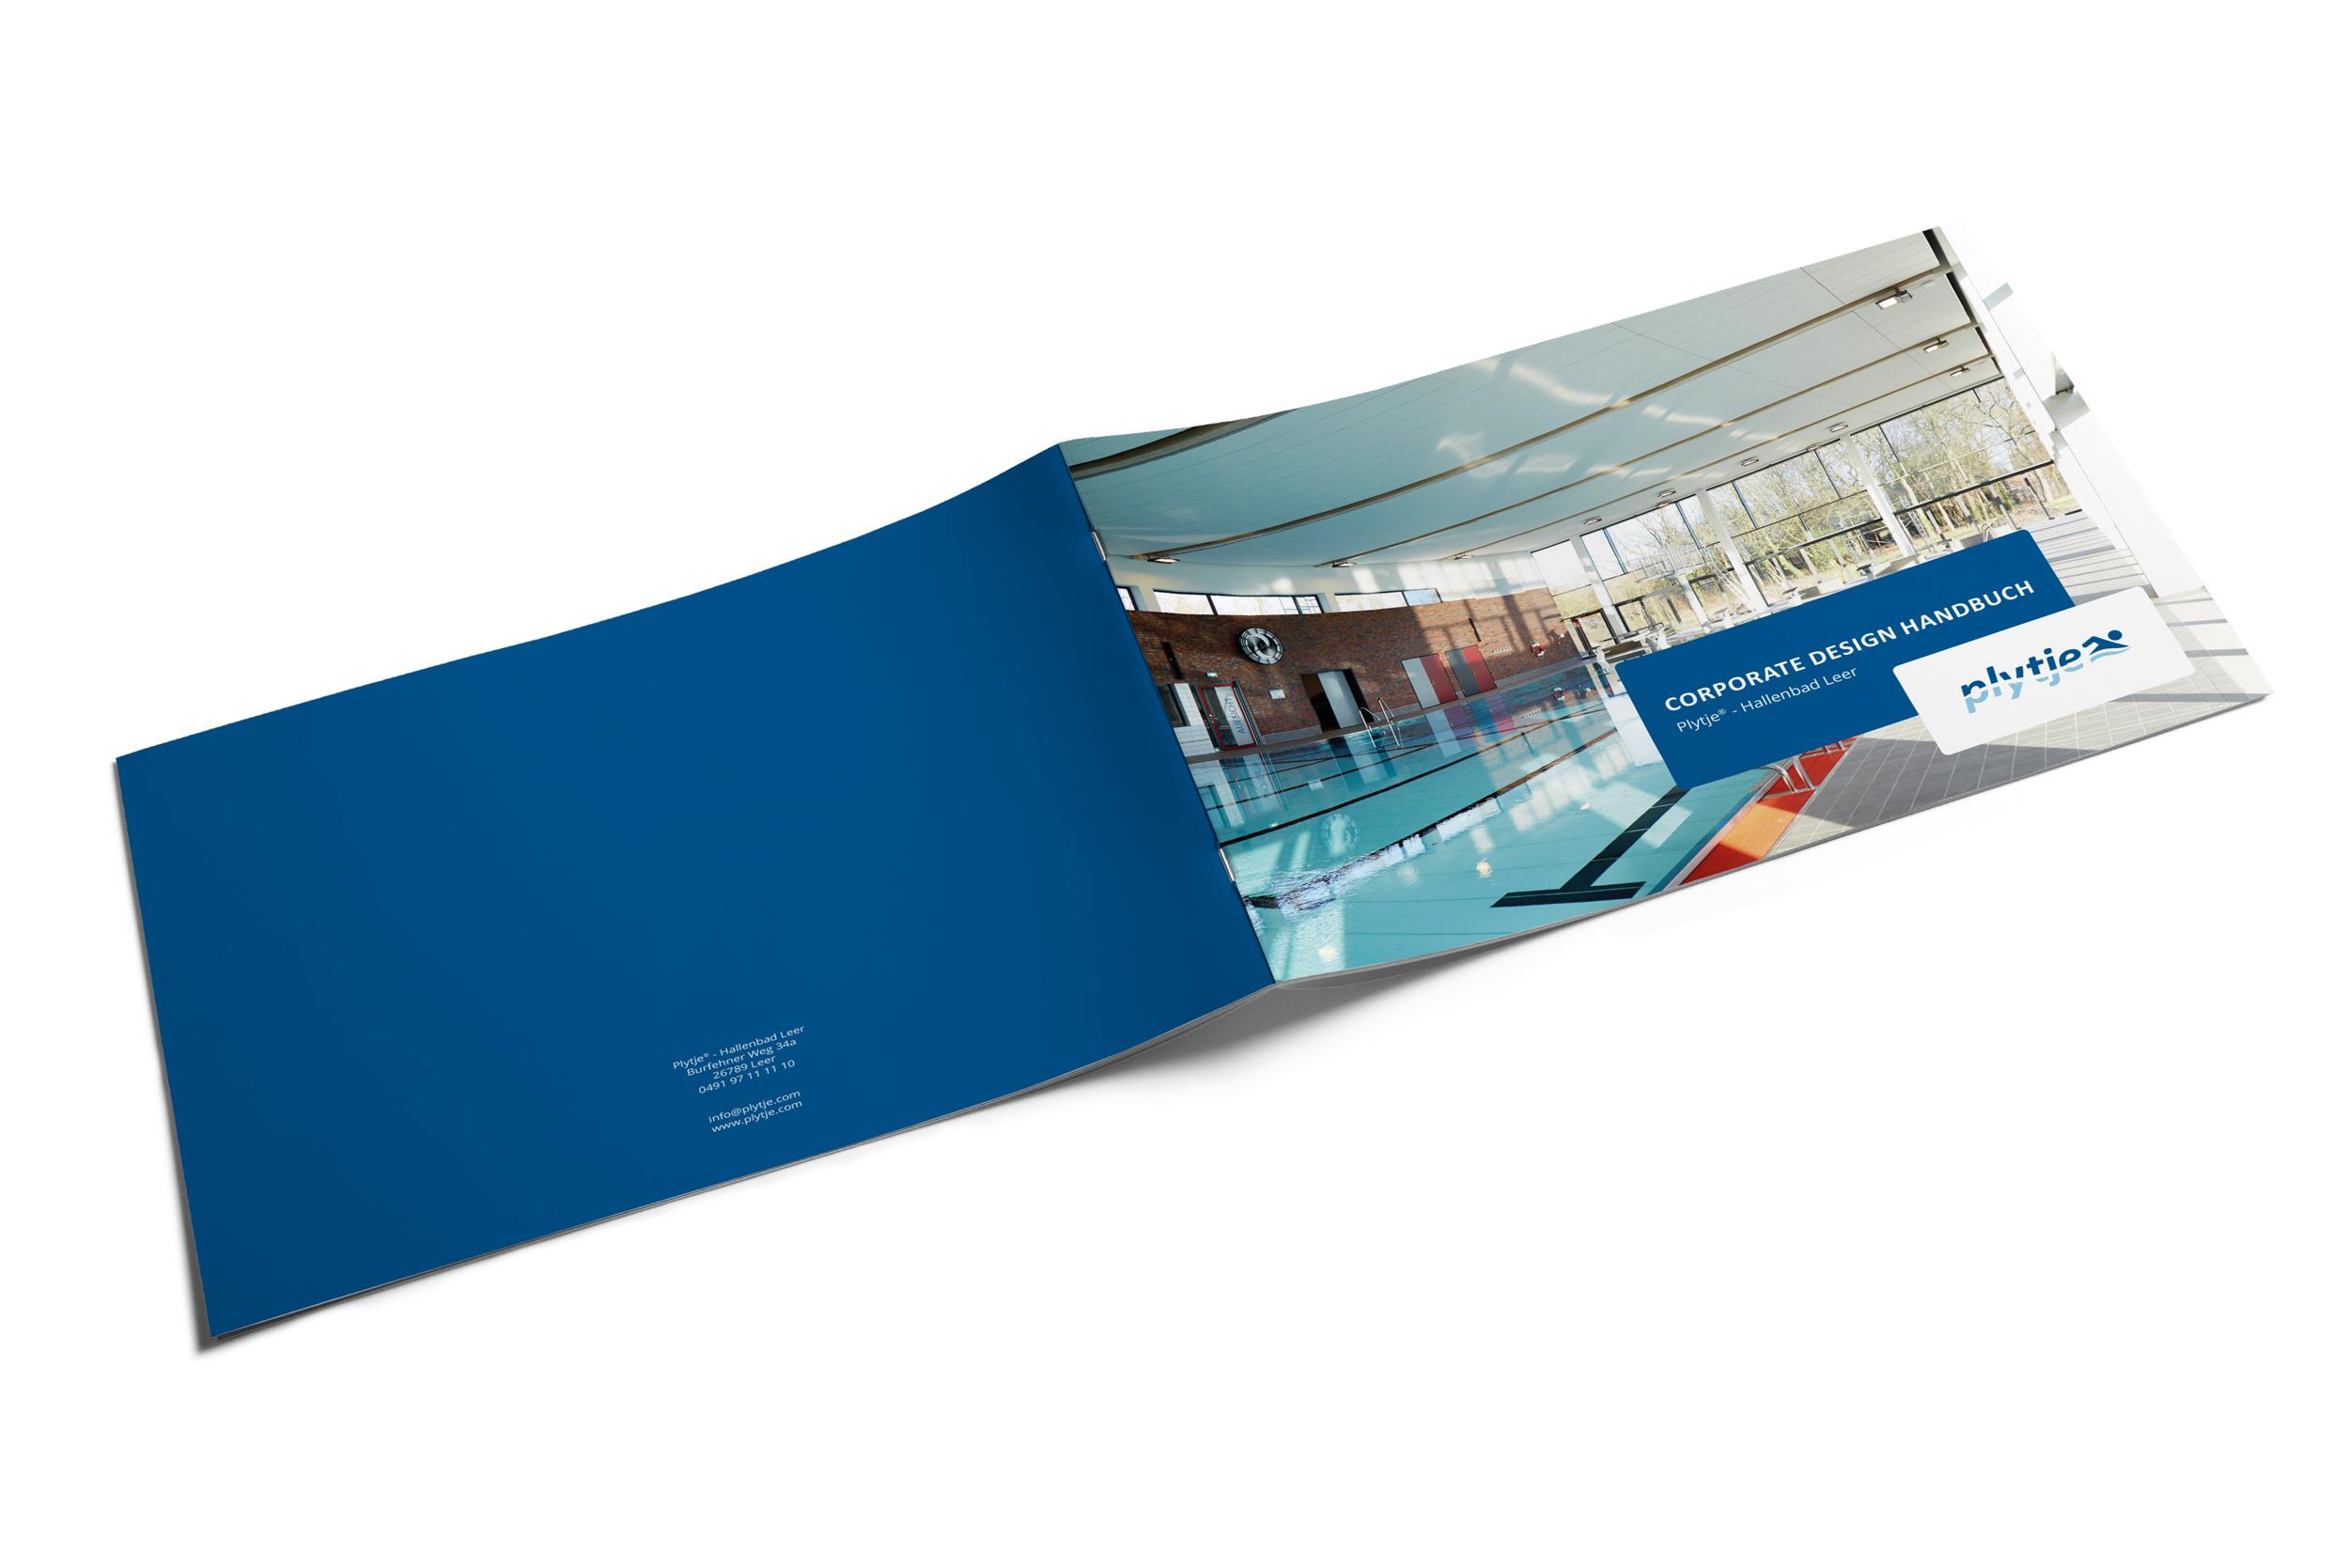 Rueckseite-CD-Plytje-Hafenbude